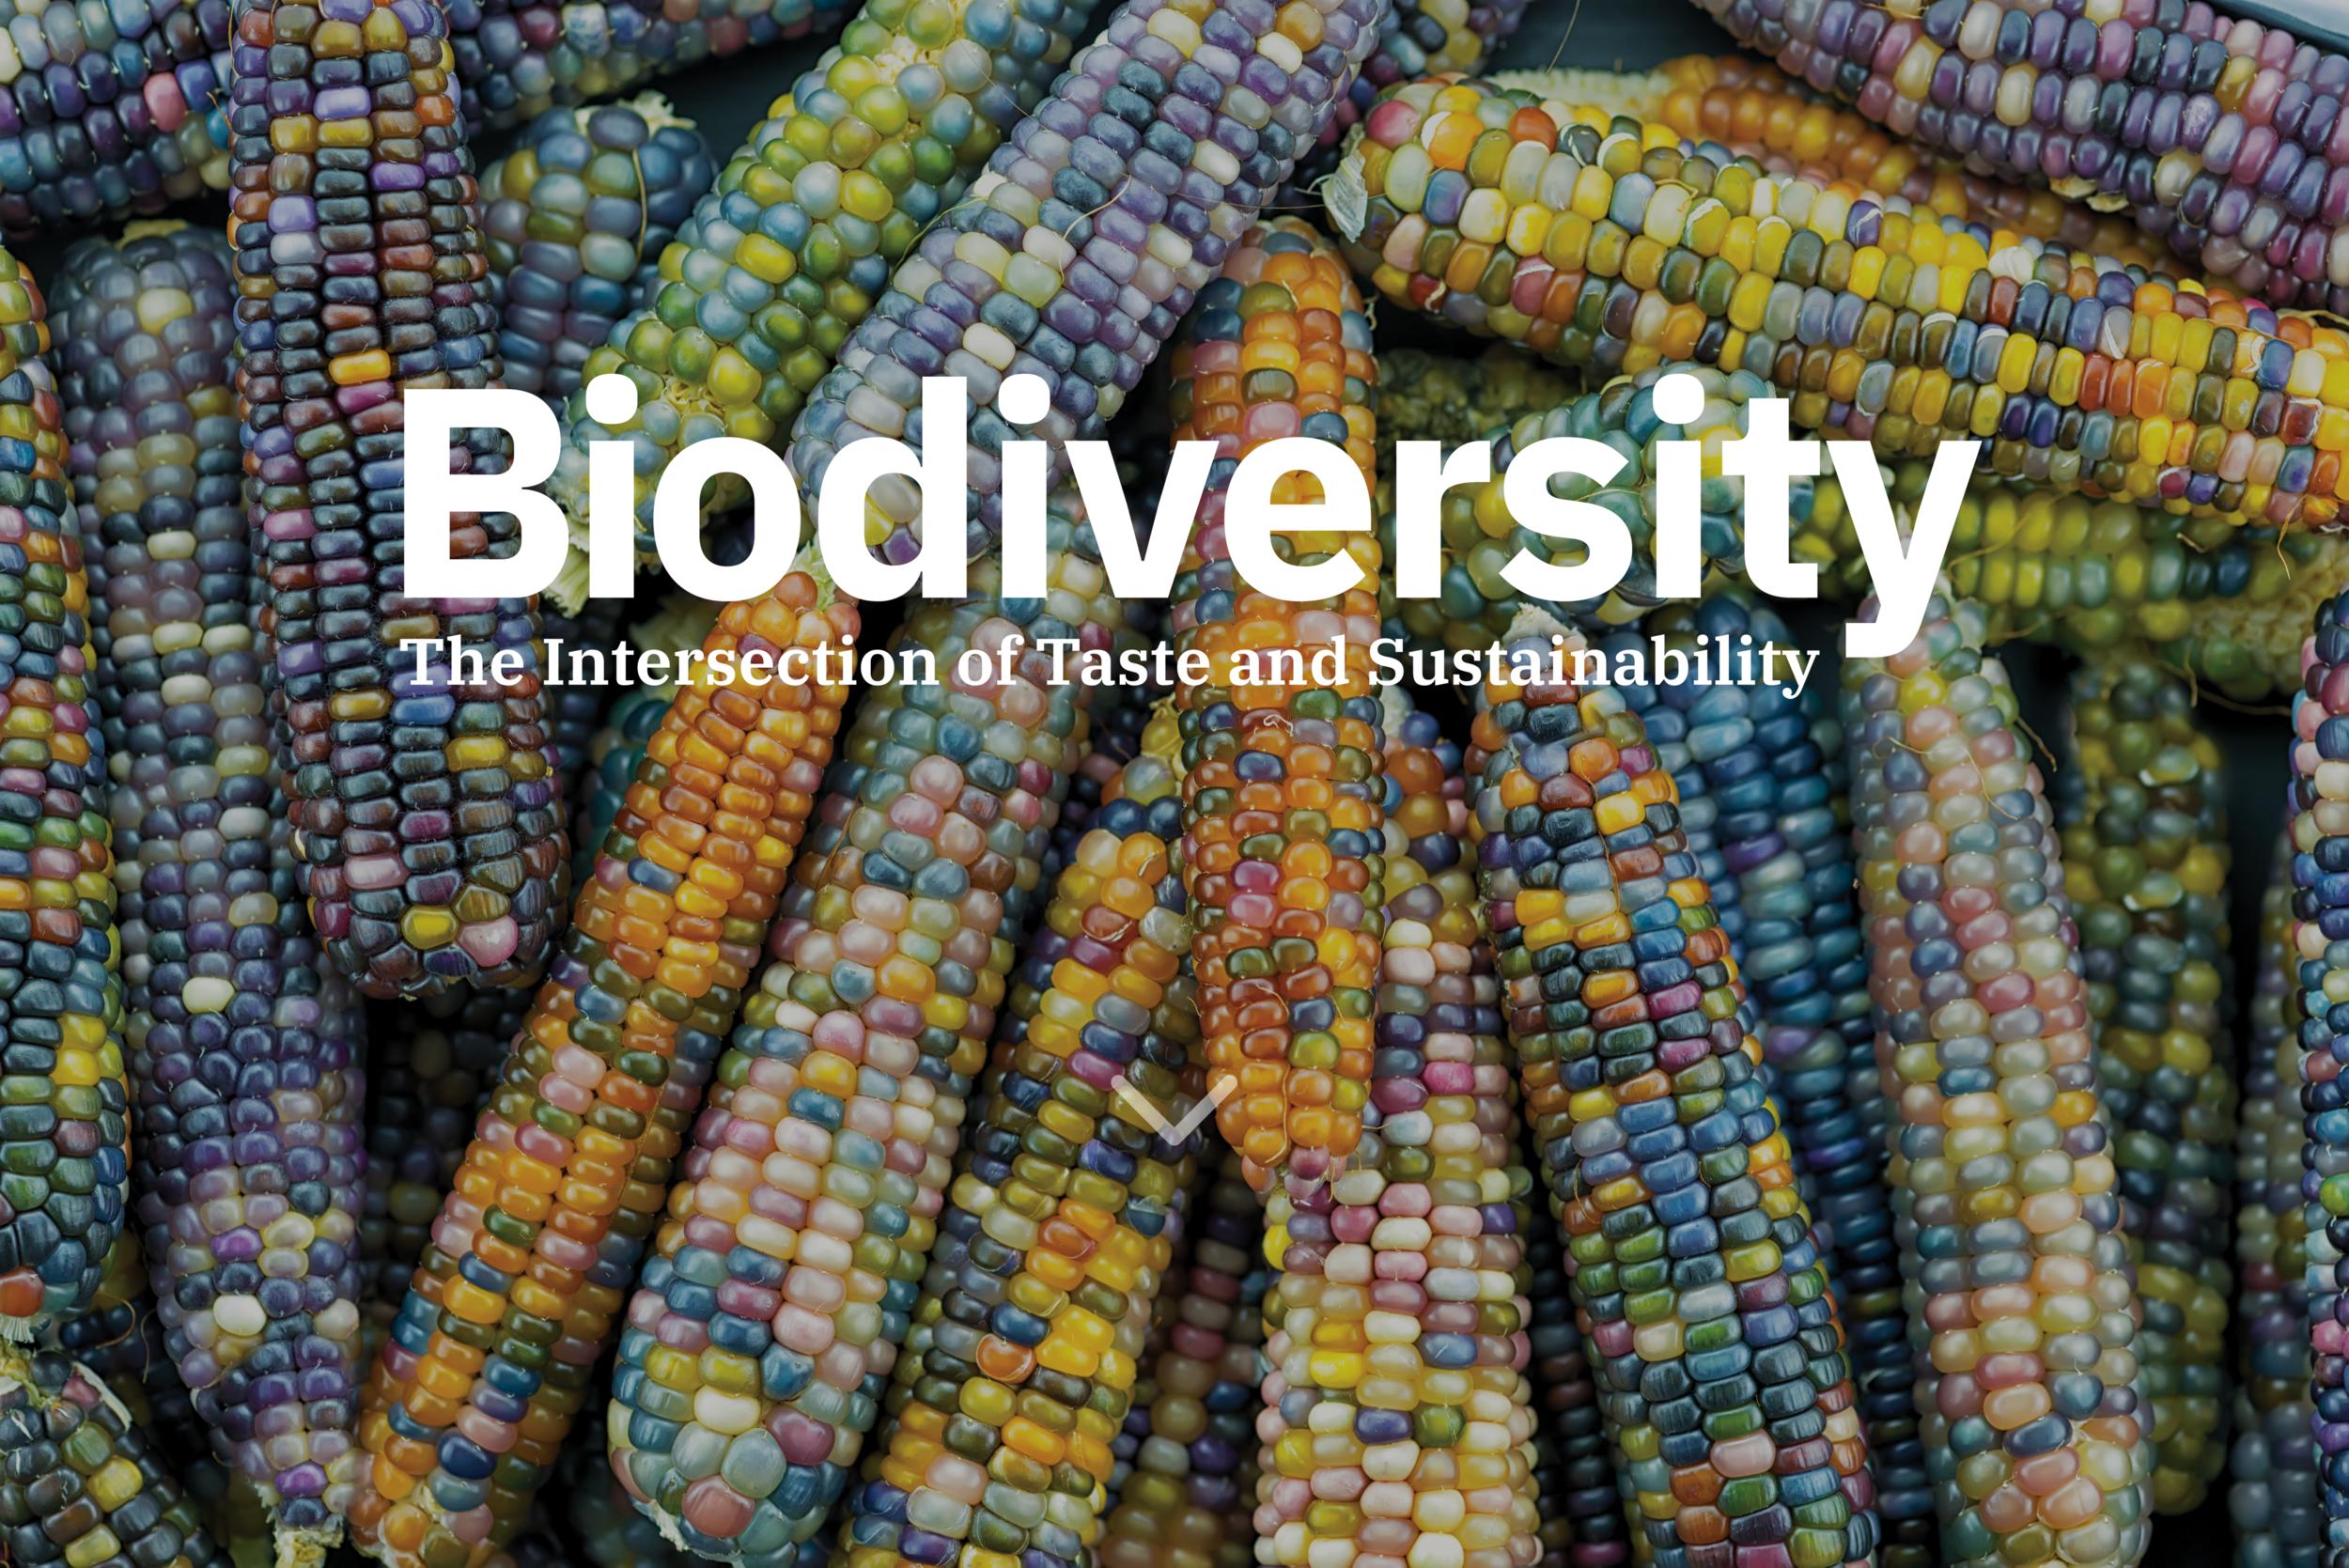 biodiversityIntroImage.png